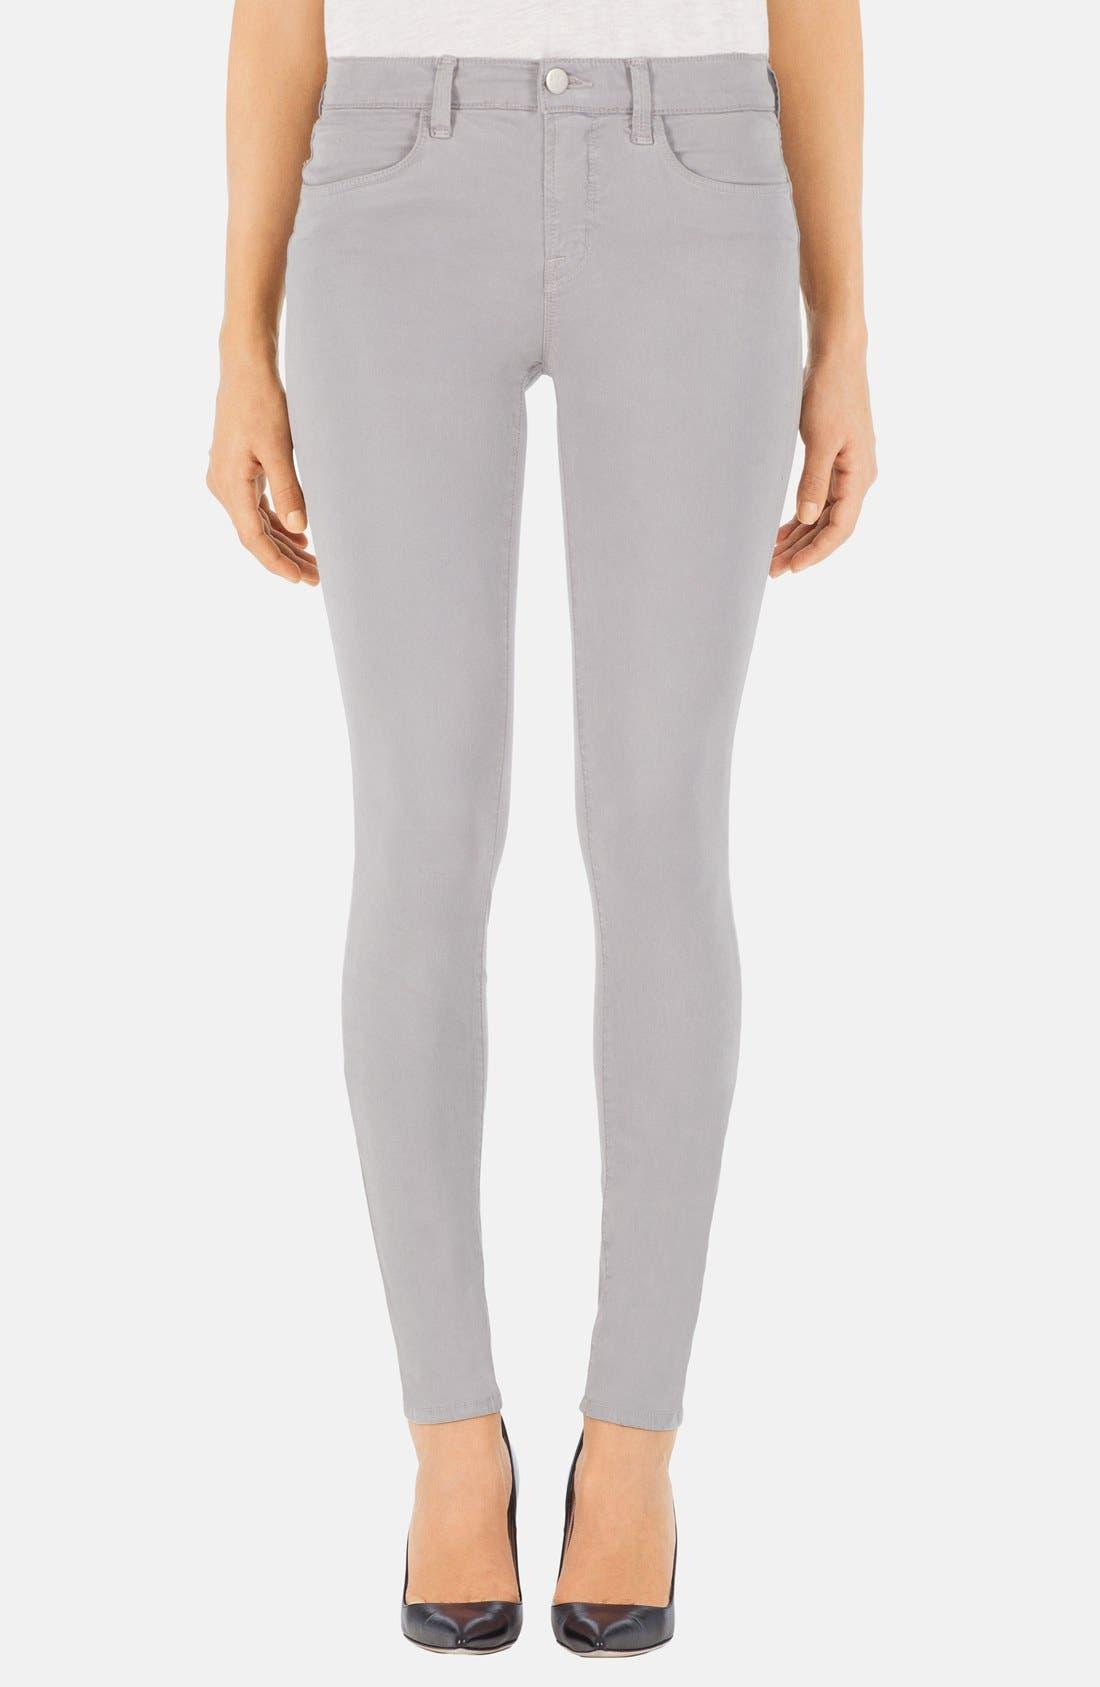 Alternate Image 1 Selected - J Brand '485' Mid Rise Super Skinny Jeans (Limestone)